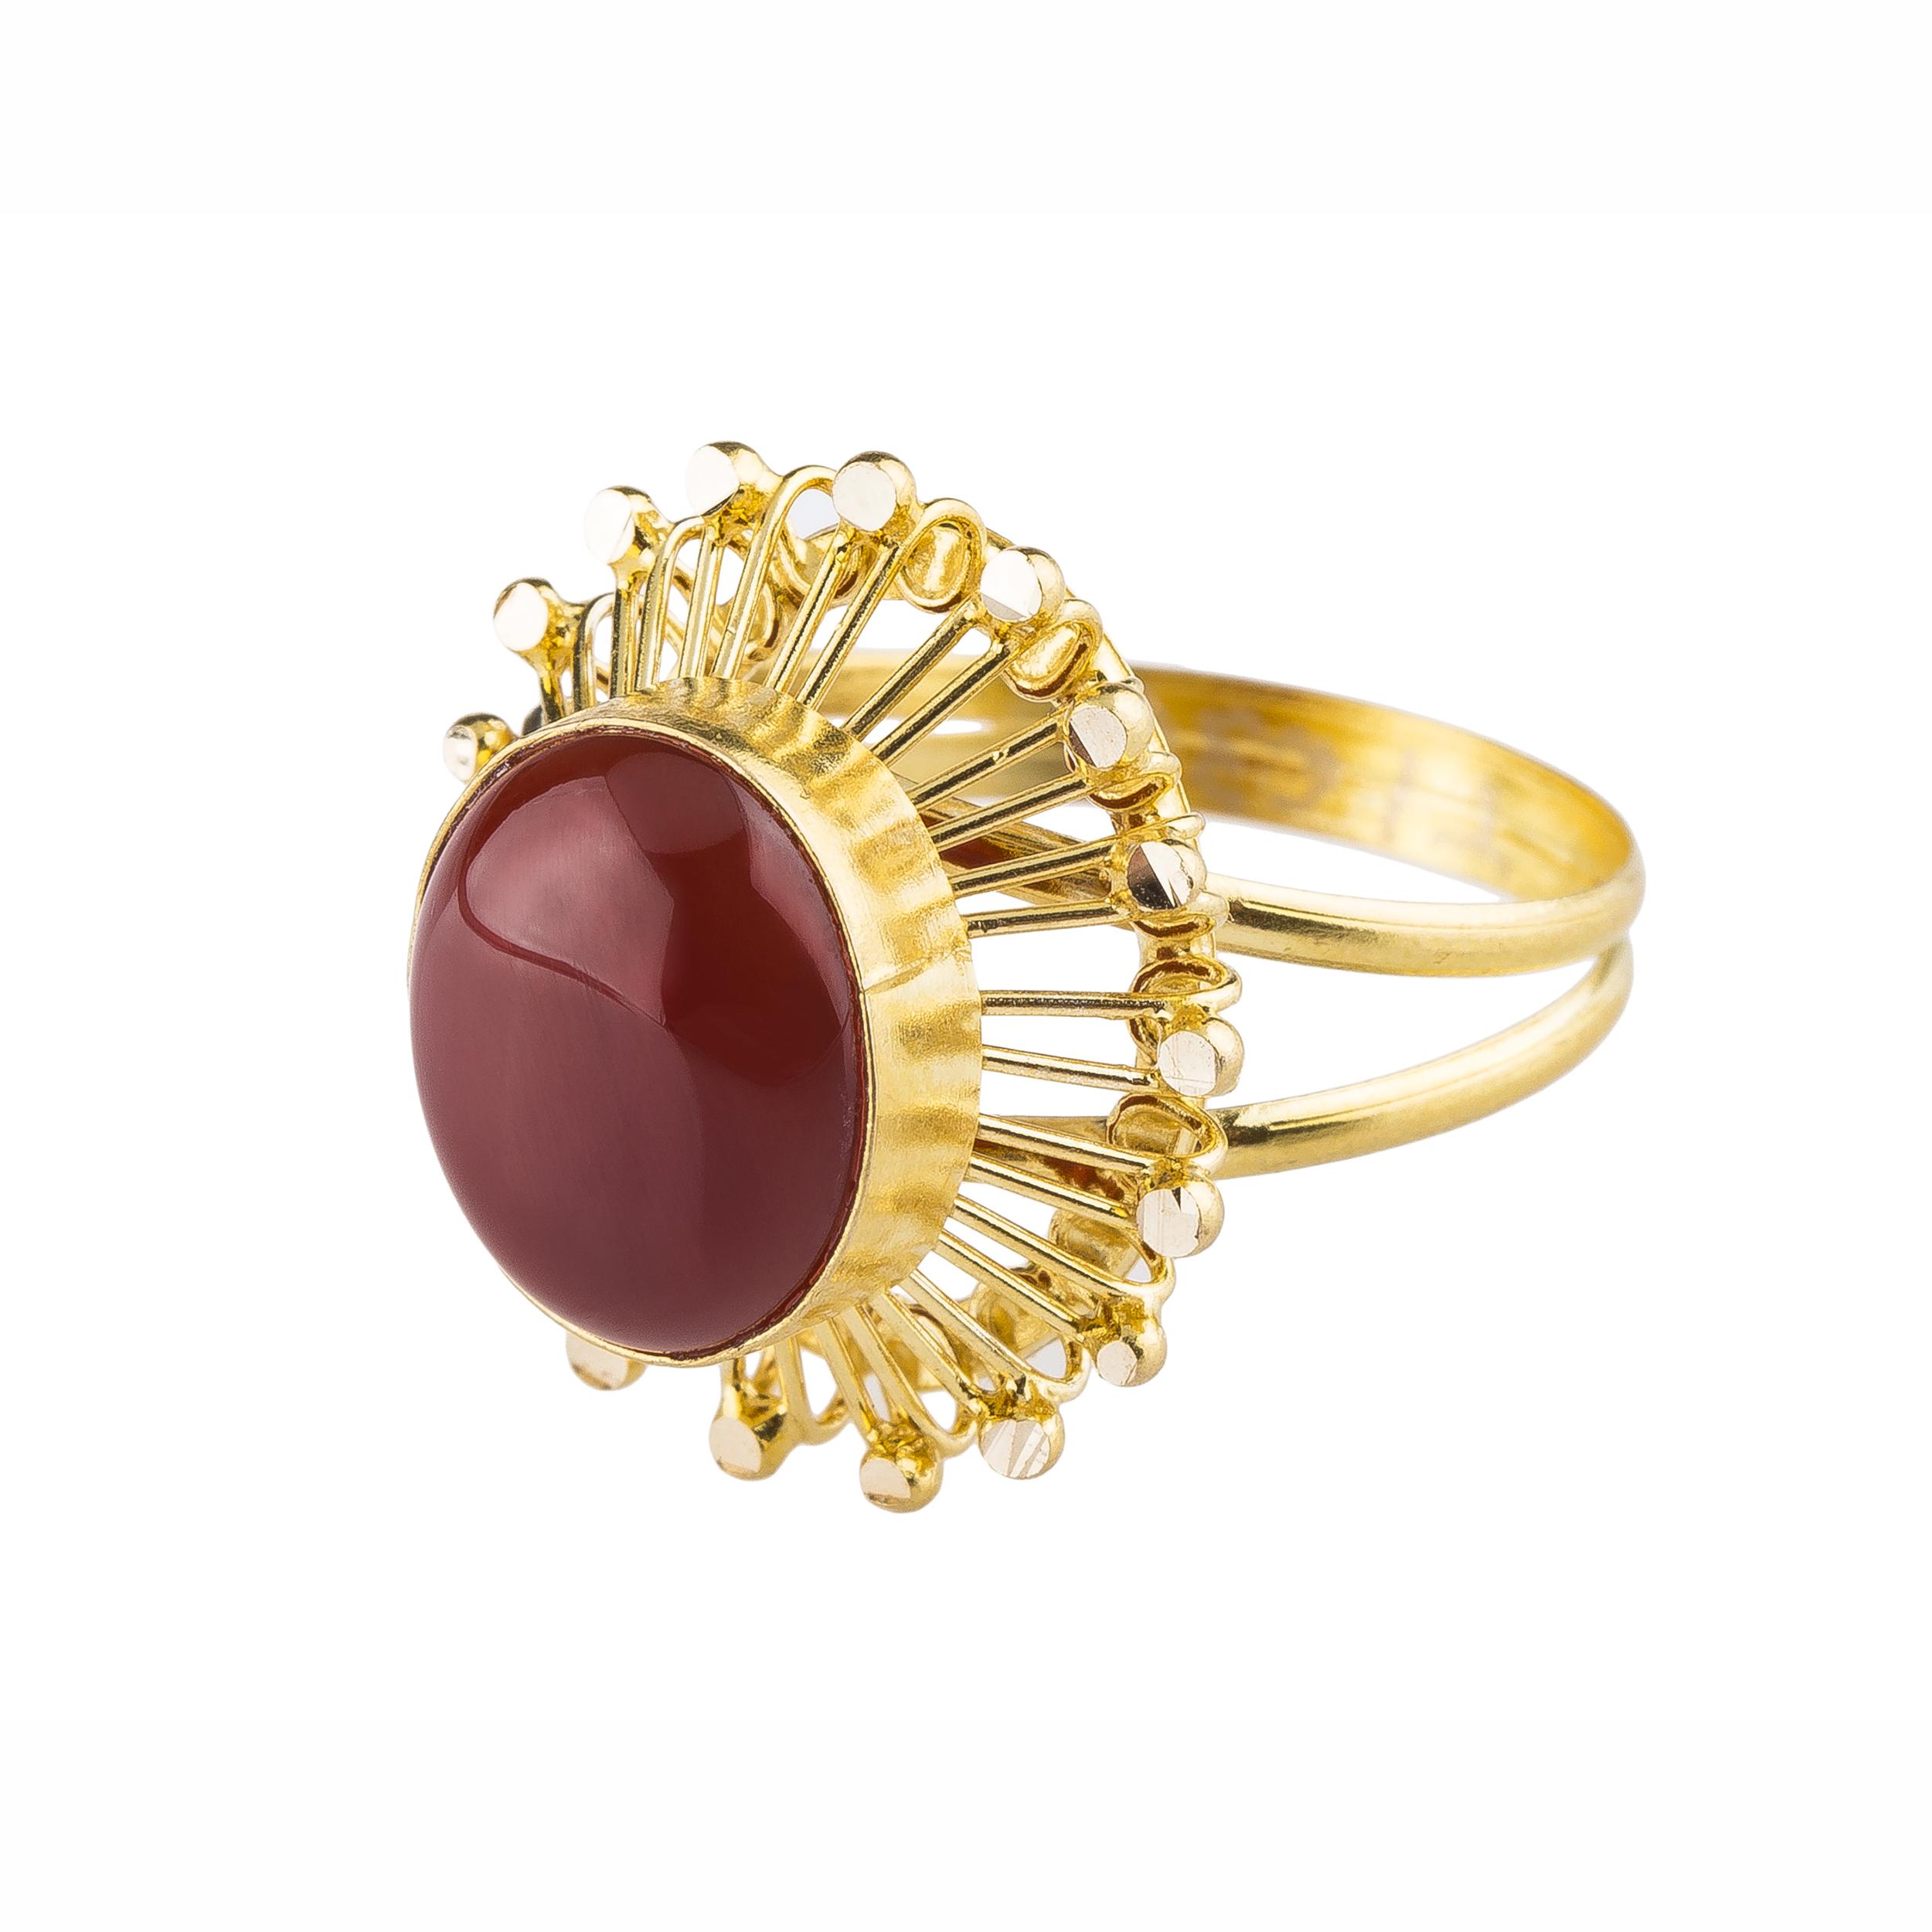 قیمت انگشتر طلا 18 عیار کد R104